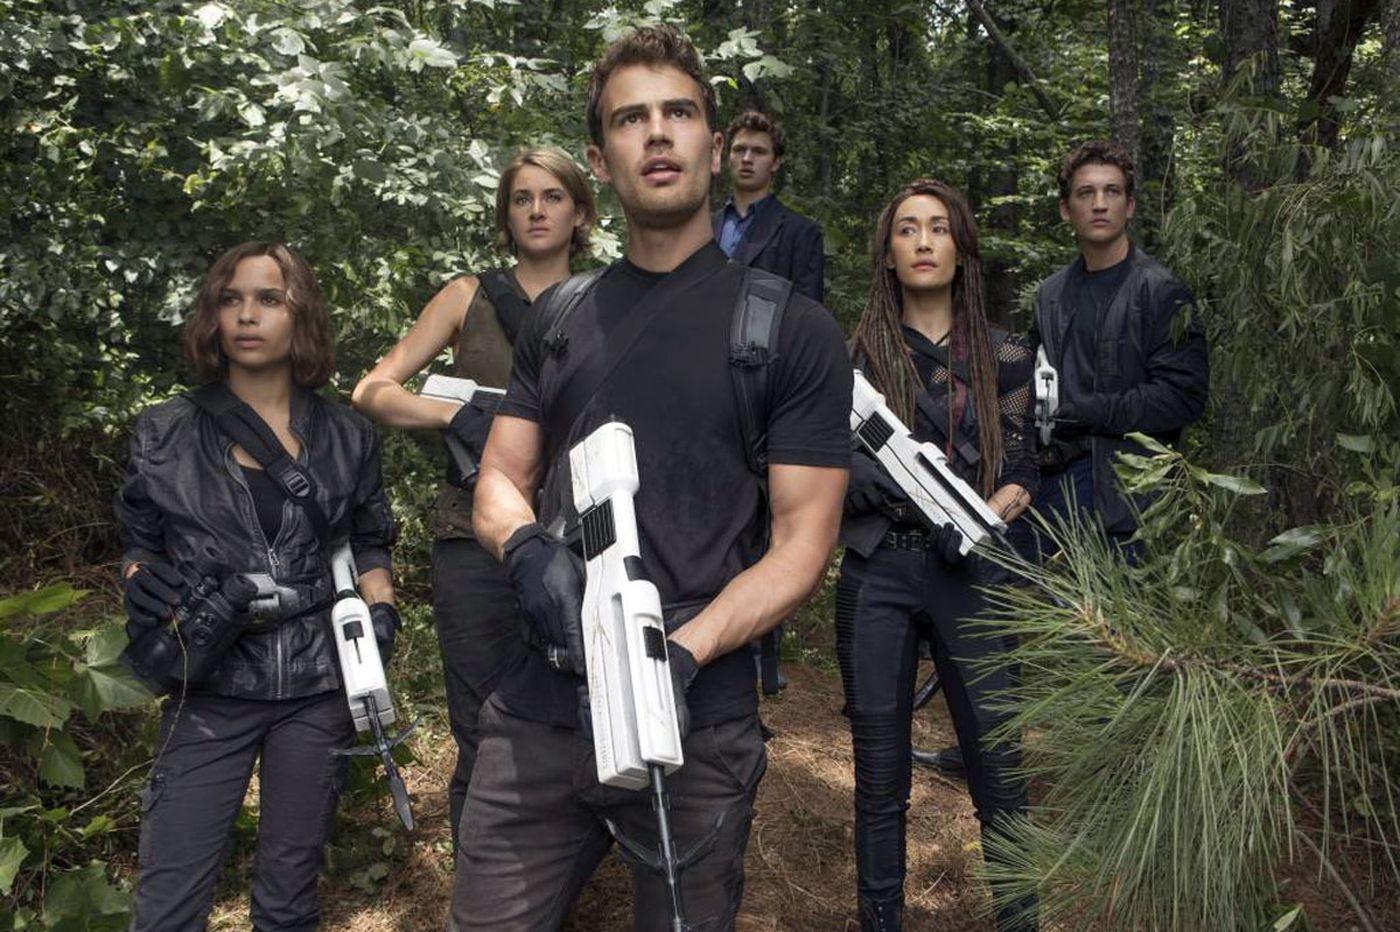 'The Divergent Series: Allegiant - Part 1': Place-filler third installment full of clichés